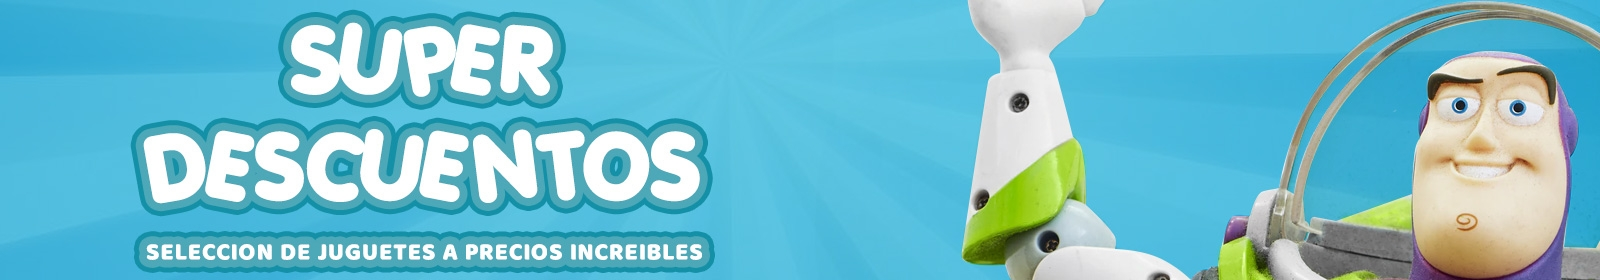 Super descuentos online en juguetes